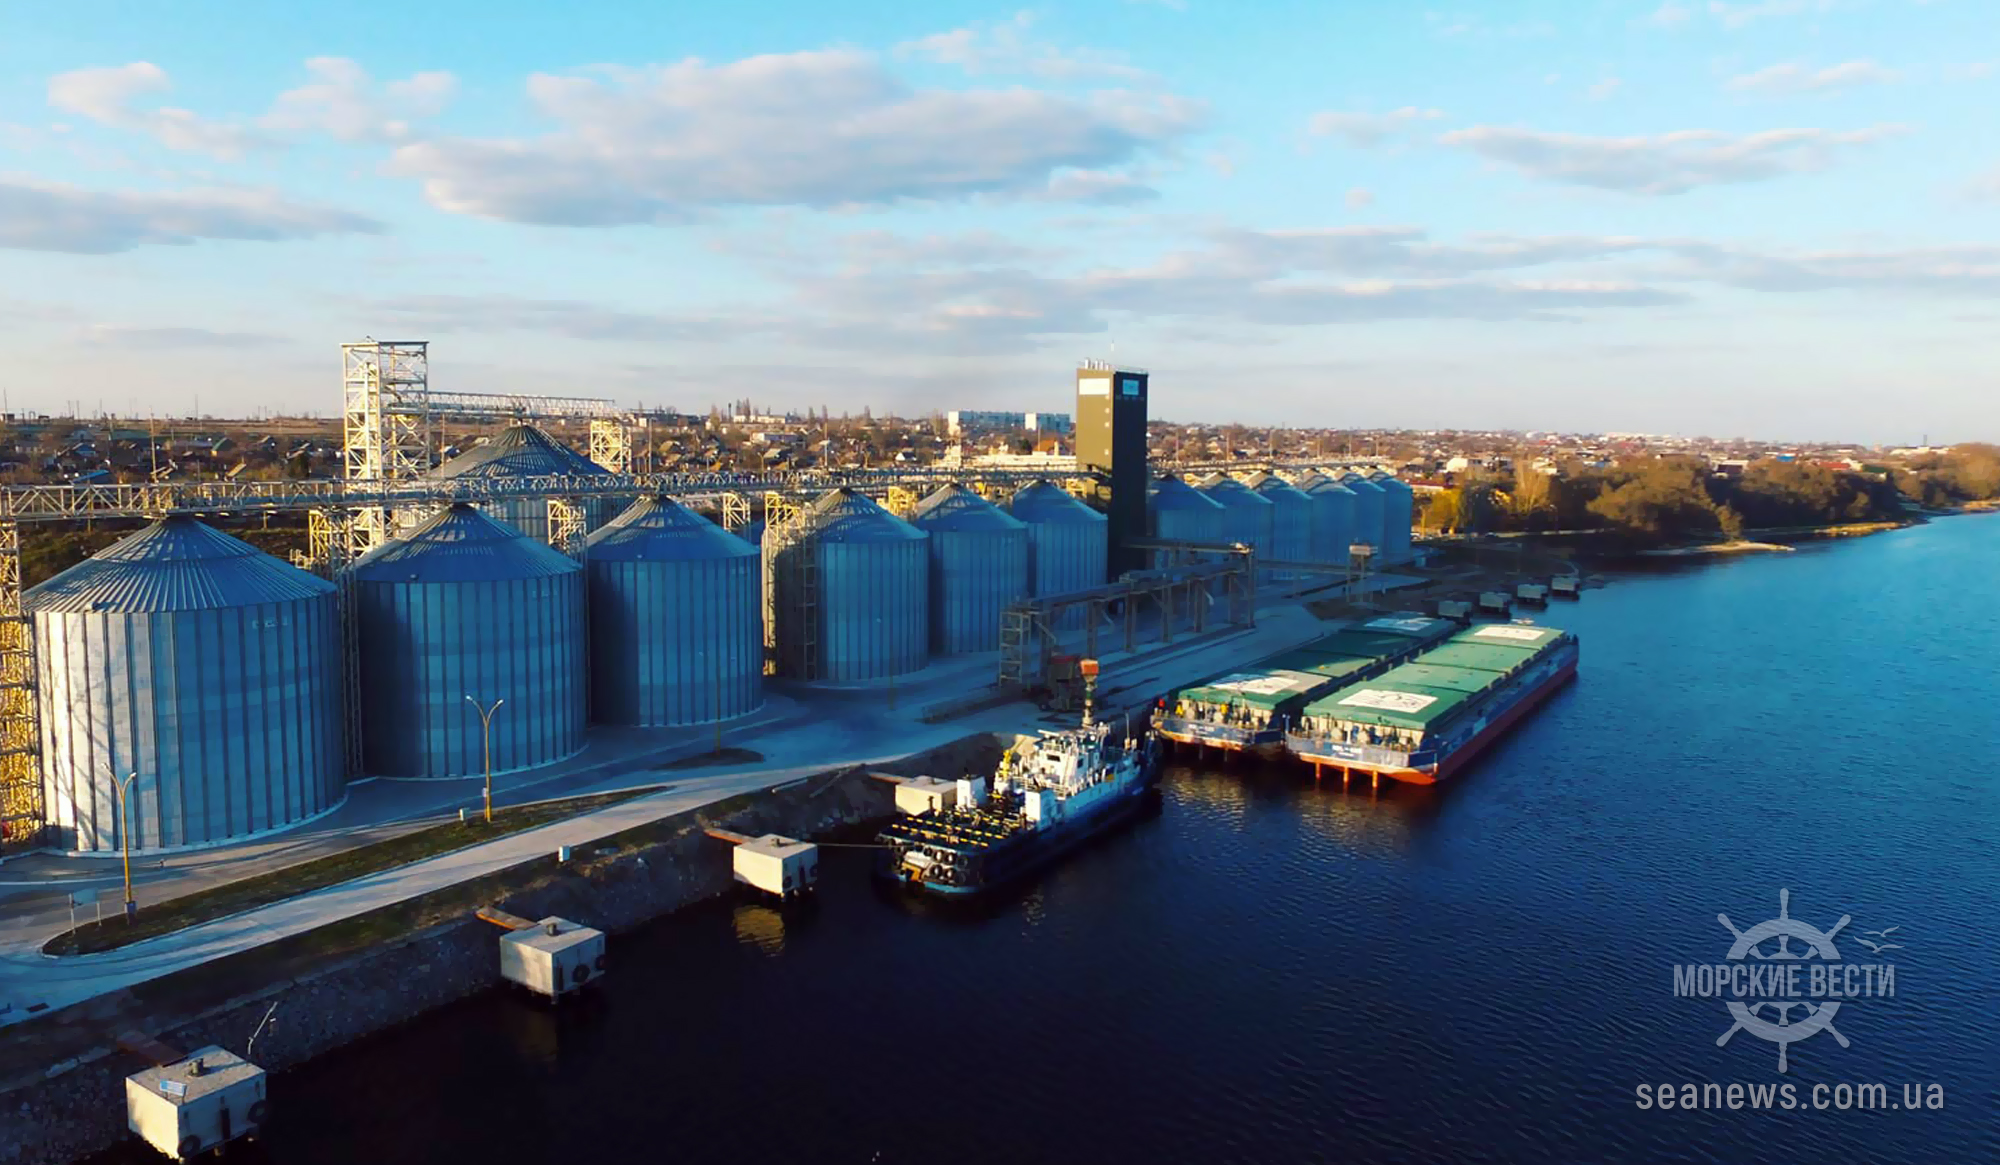 Перевозка грузов по Днепру упала на 5,3%